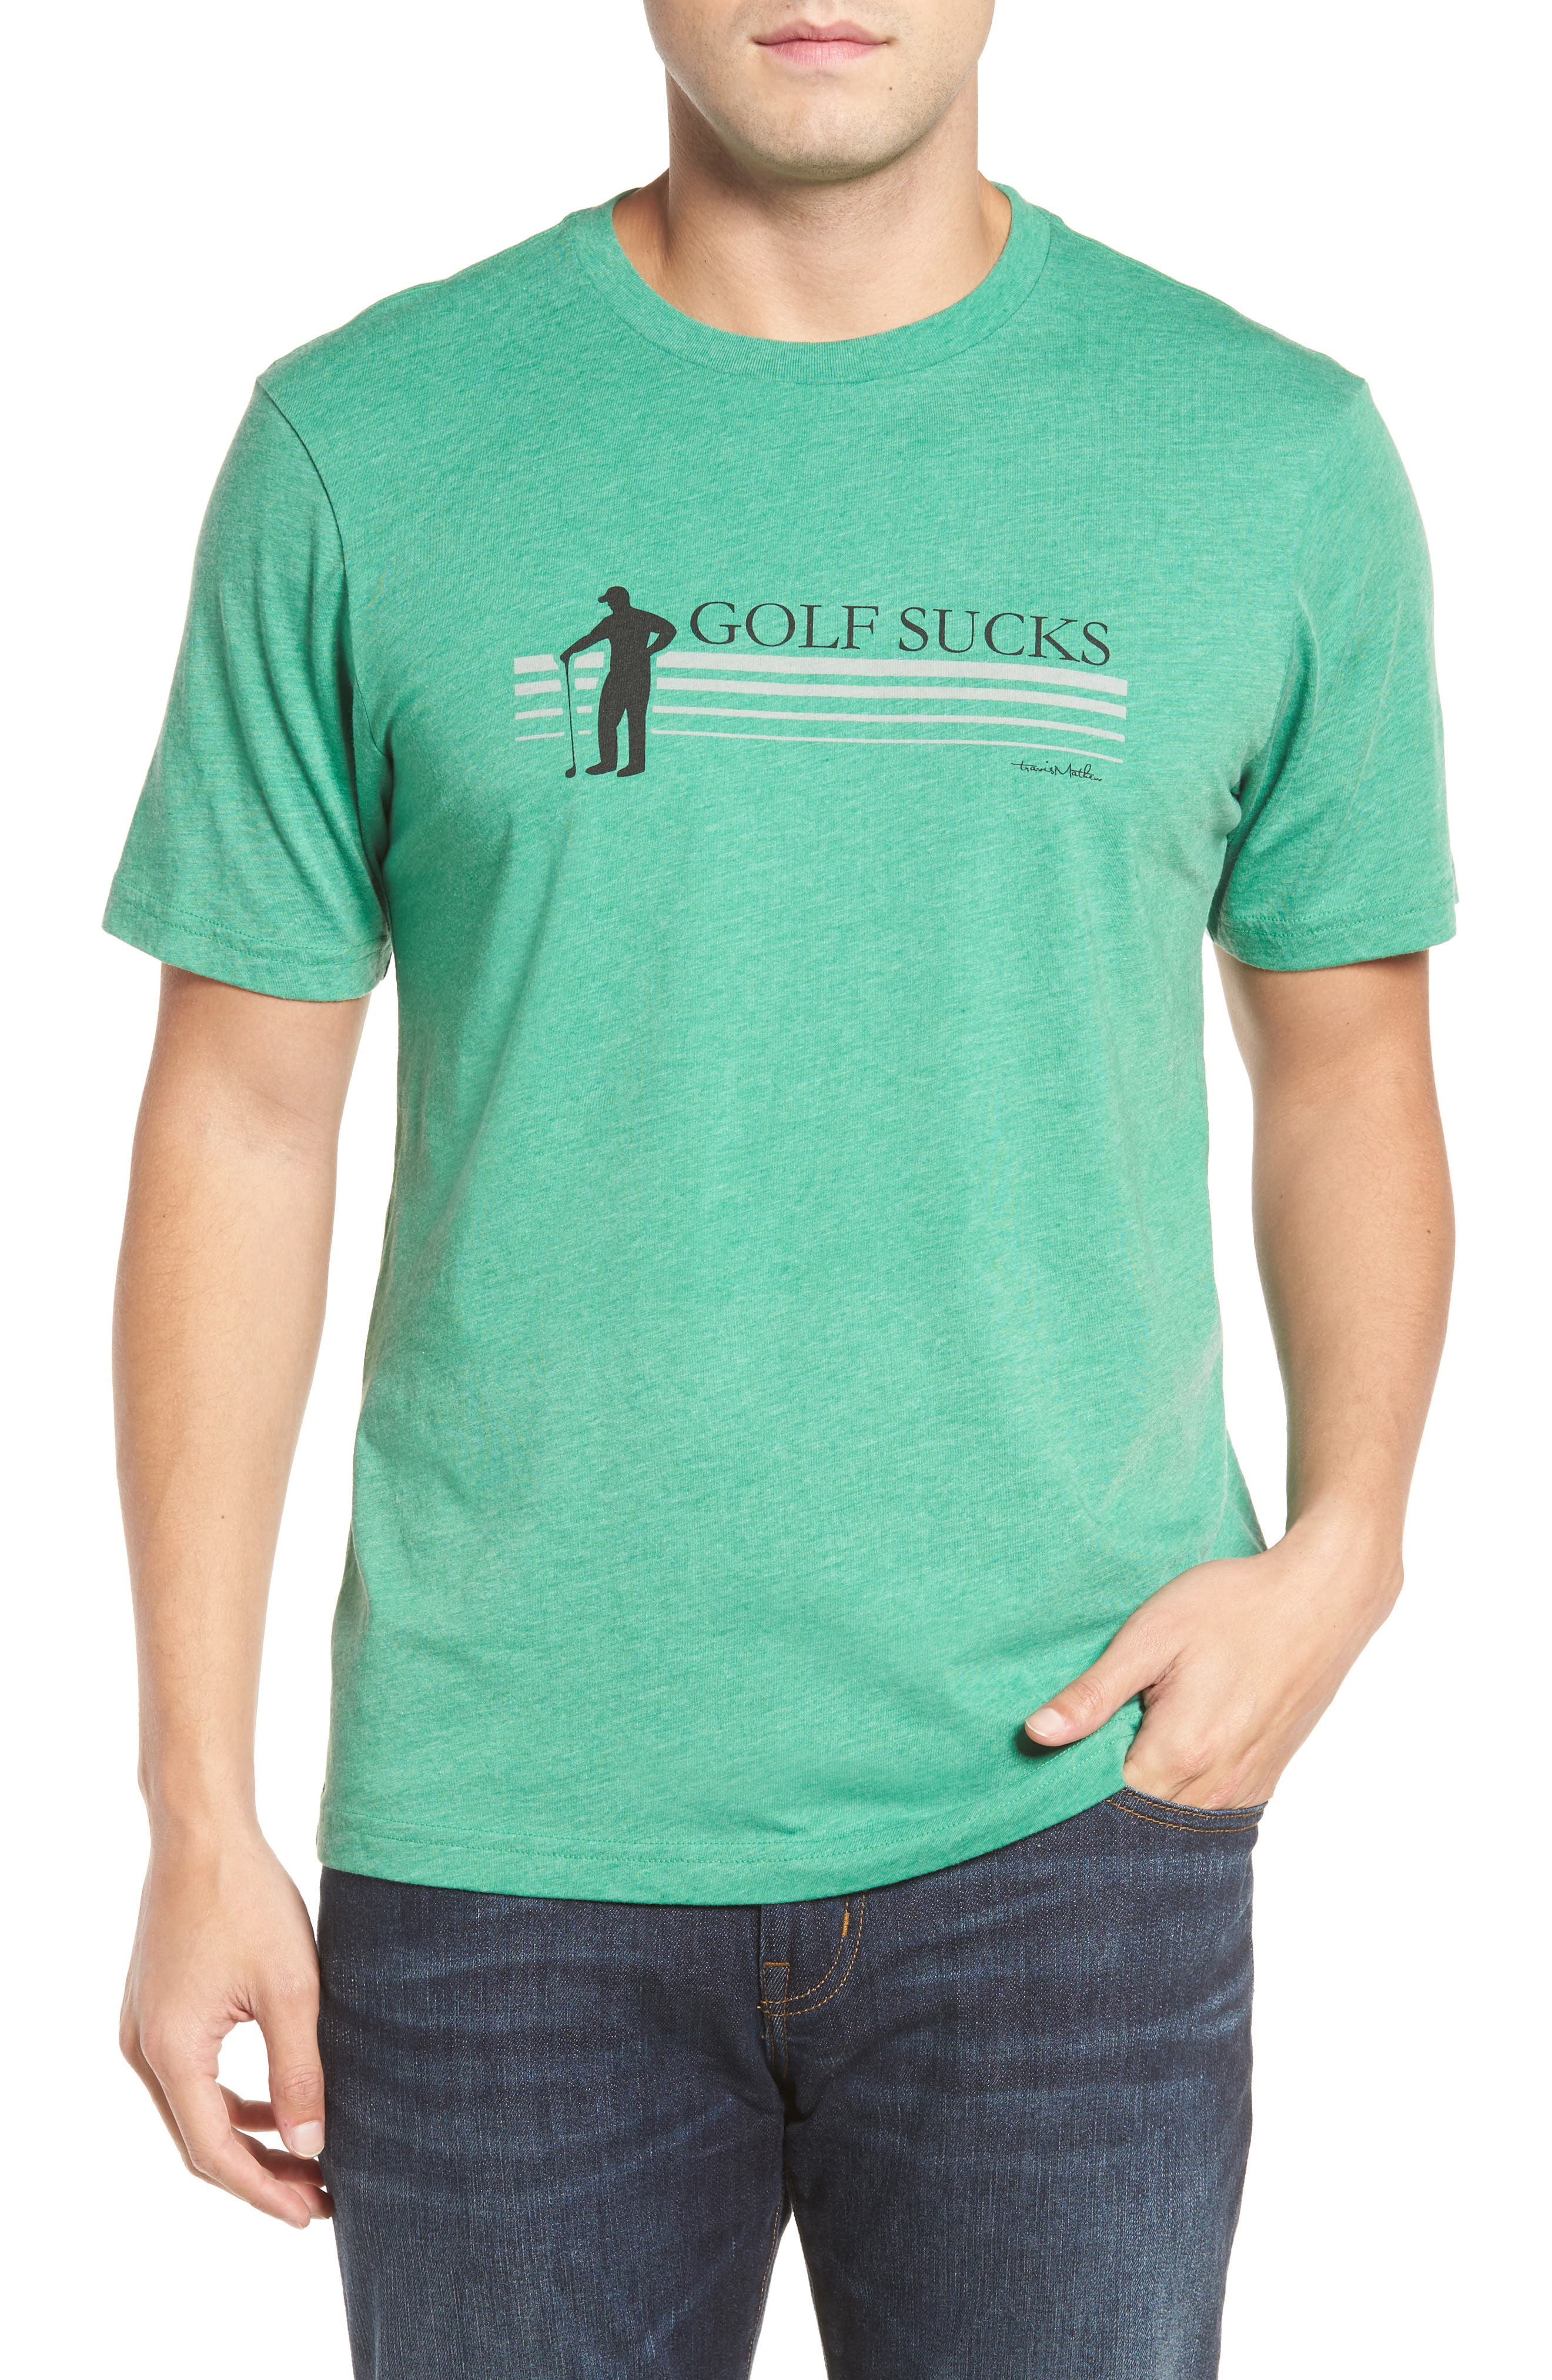 Jason T-Shirt,                             Main thumbnail 1, color,                             300